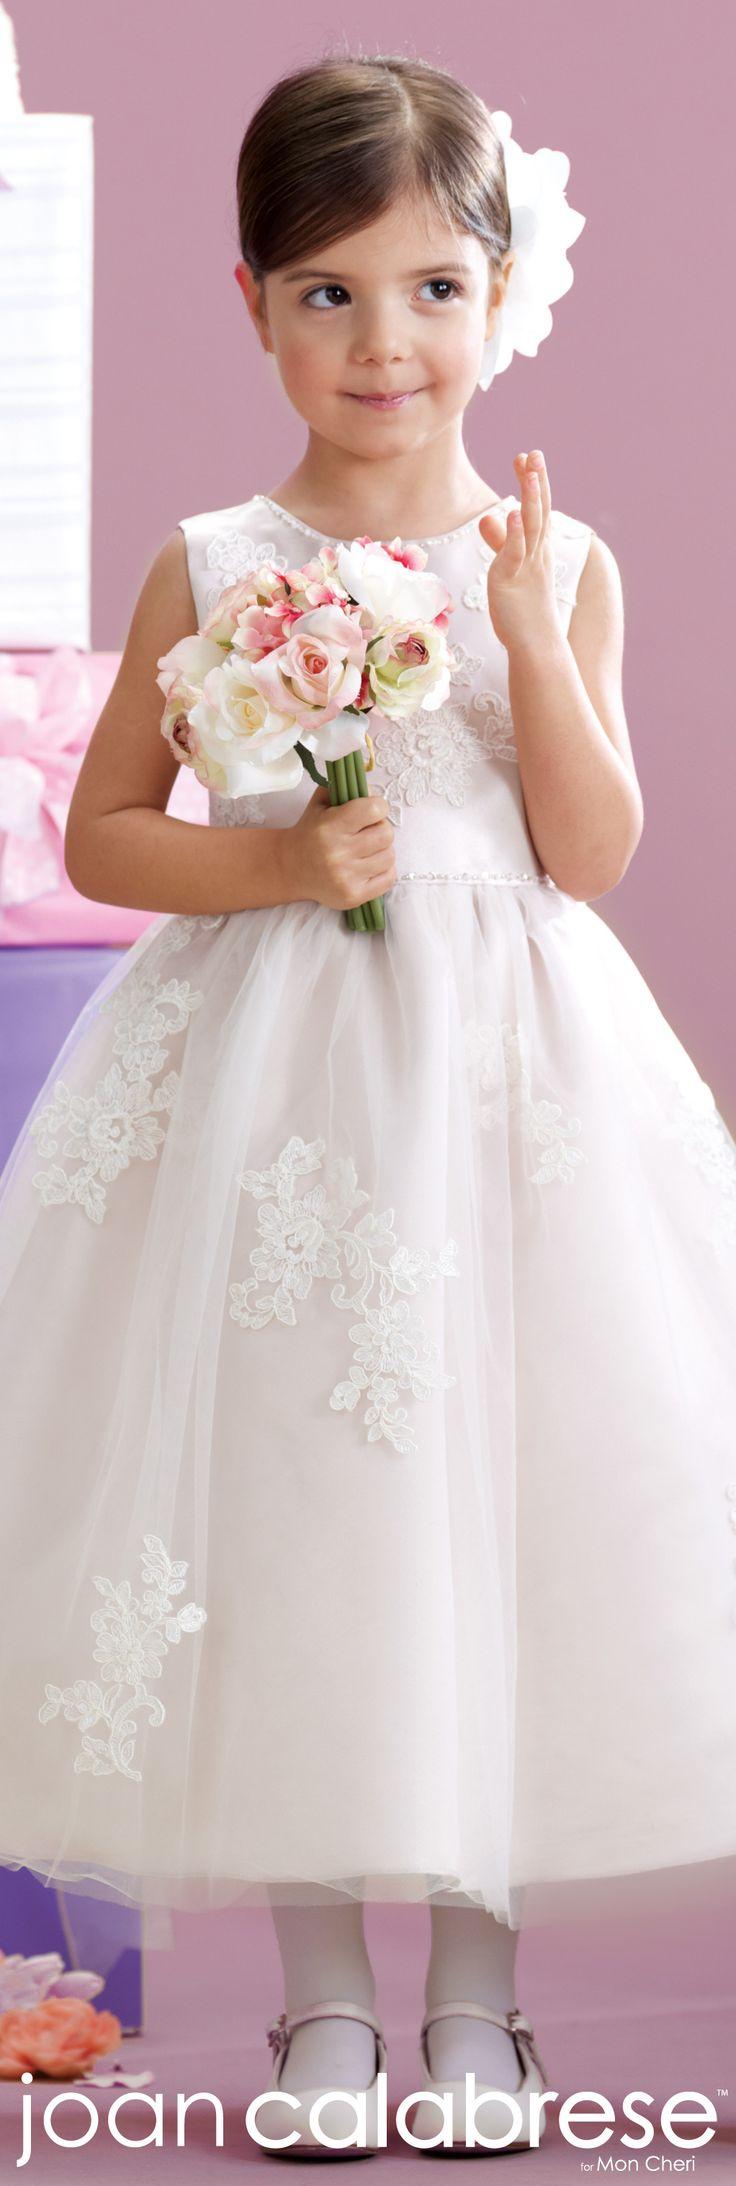 Joan Calabrese for Mon Cheri - Style No. 215341 #flowergirldresses